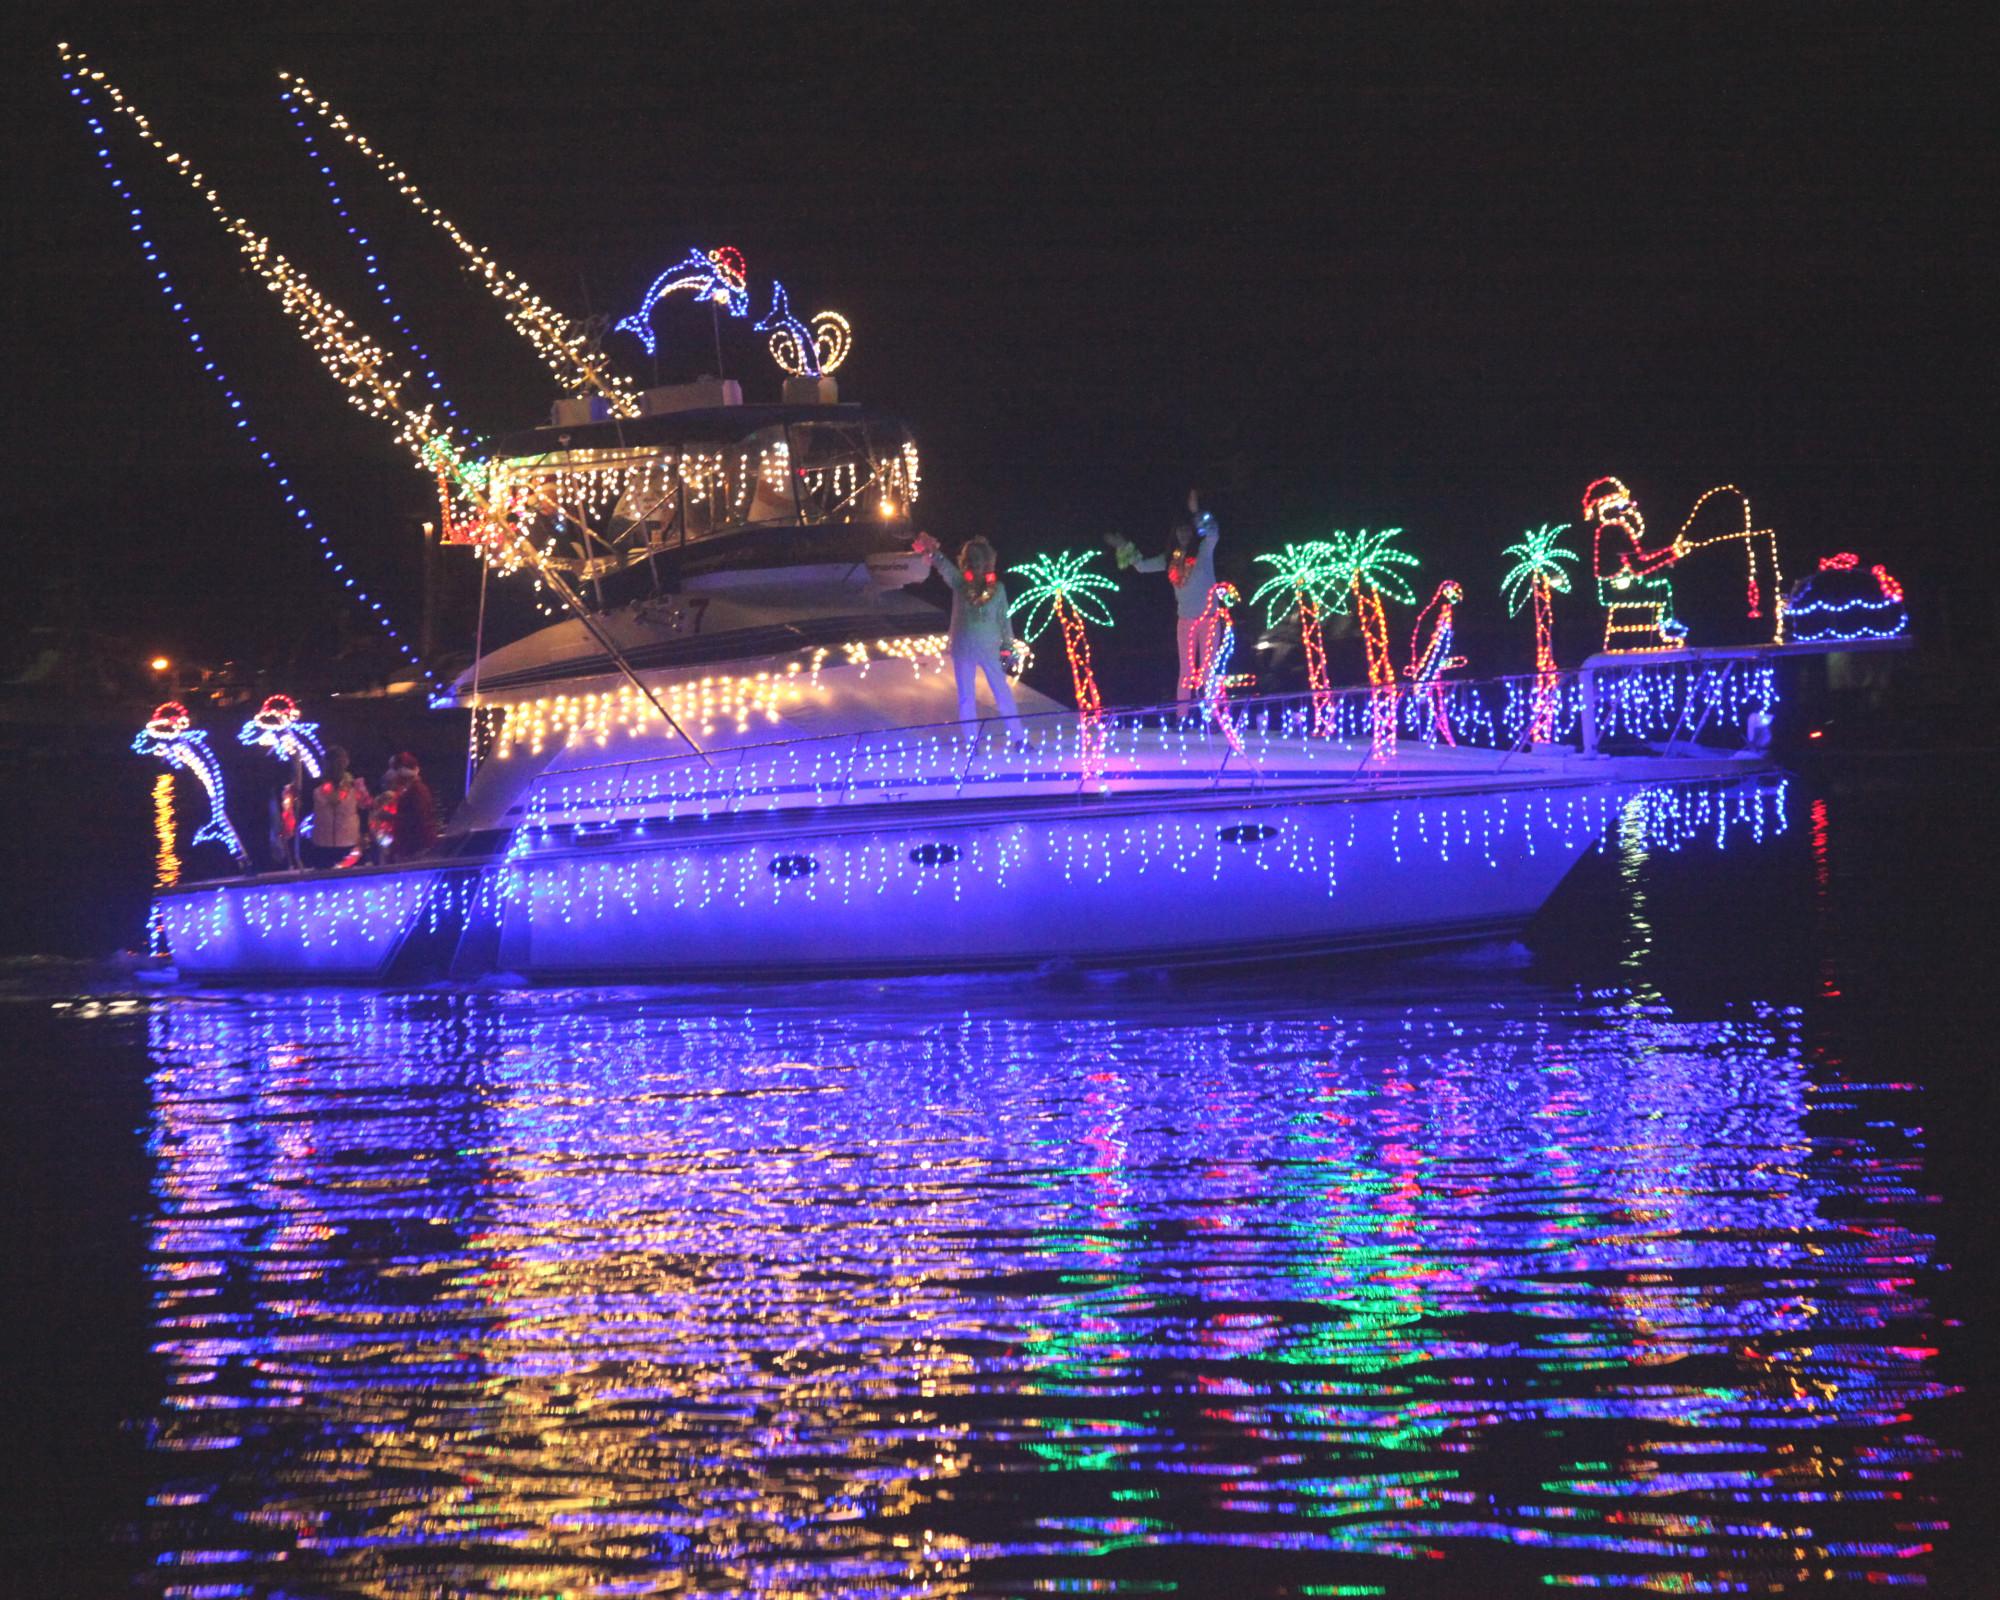 Greg Gardner - VB Boat Parade